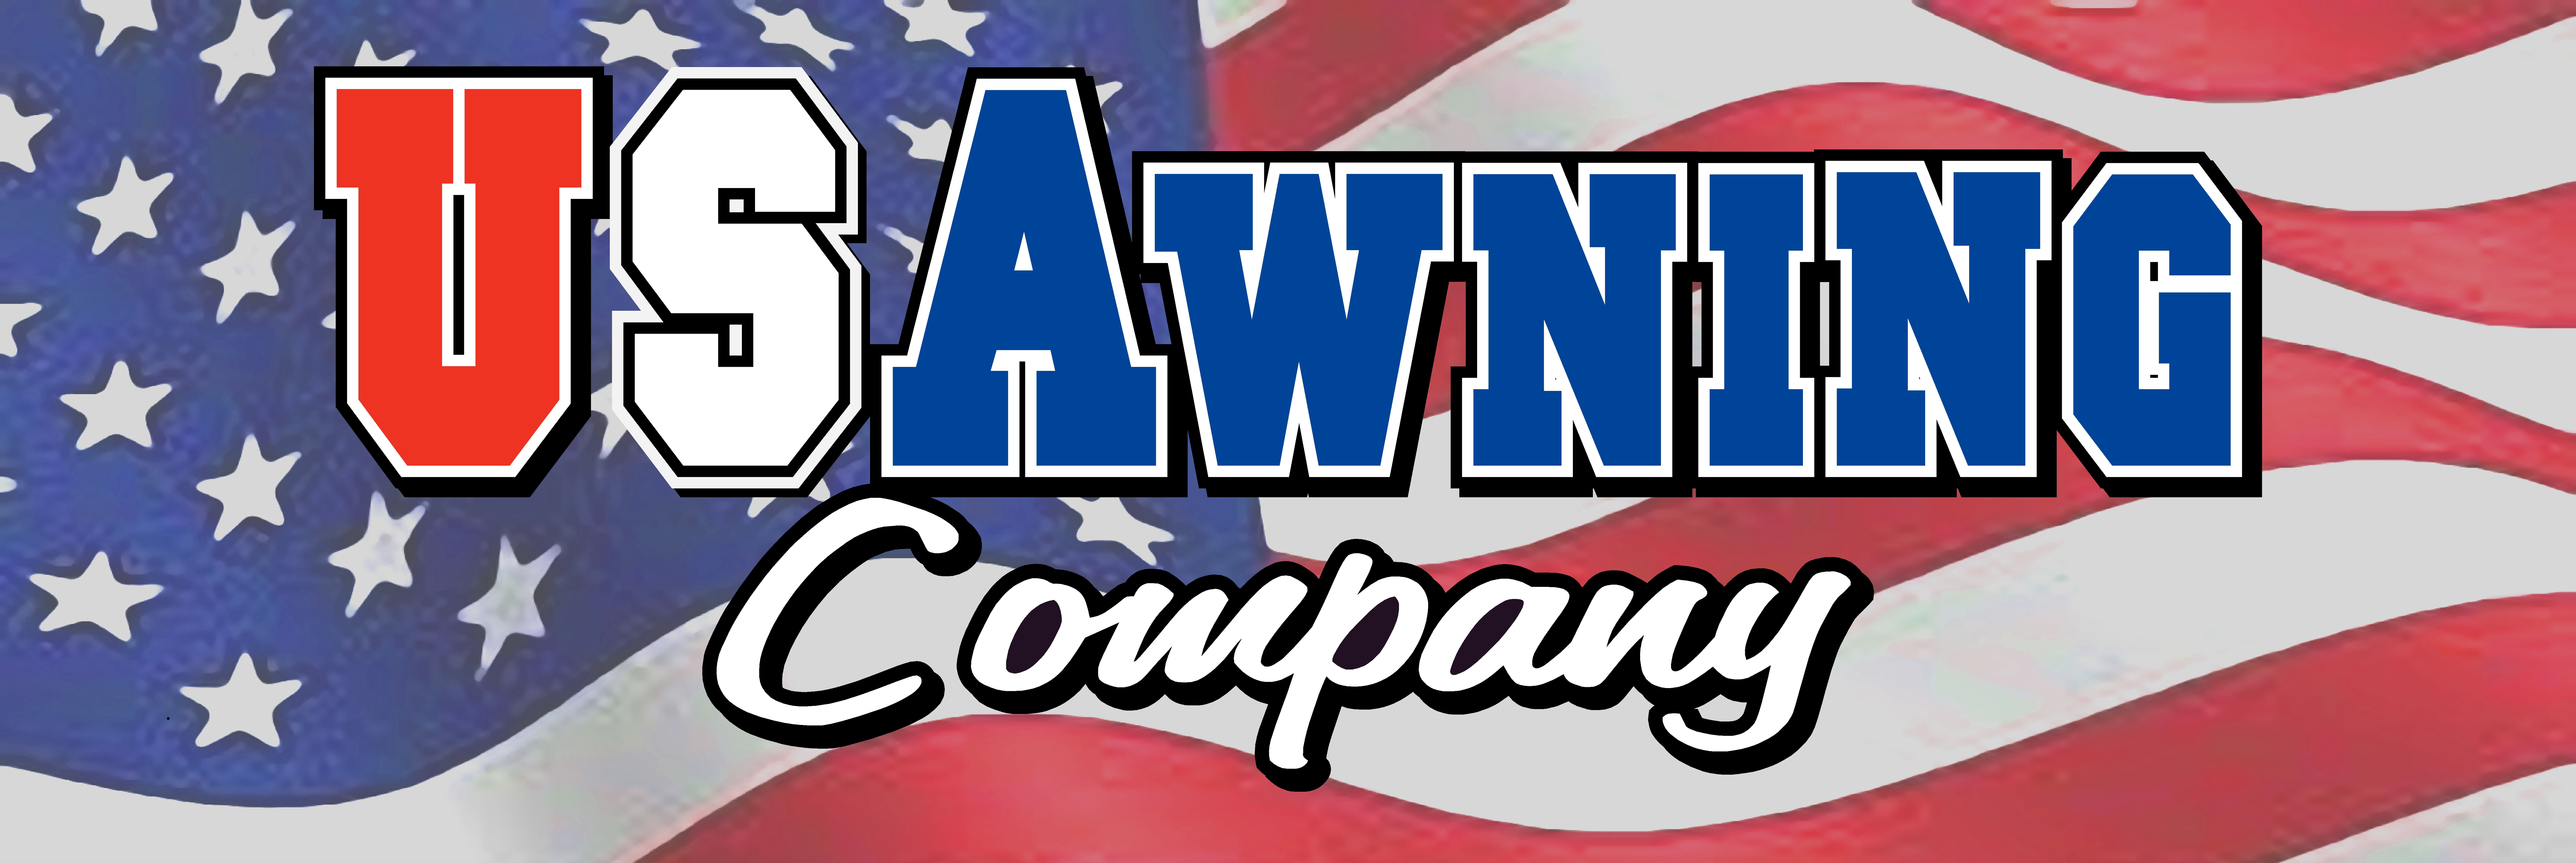 U S Awning Company image 5